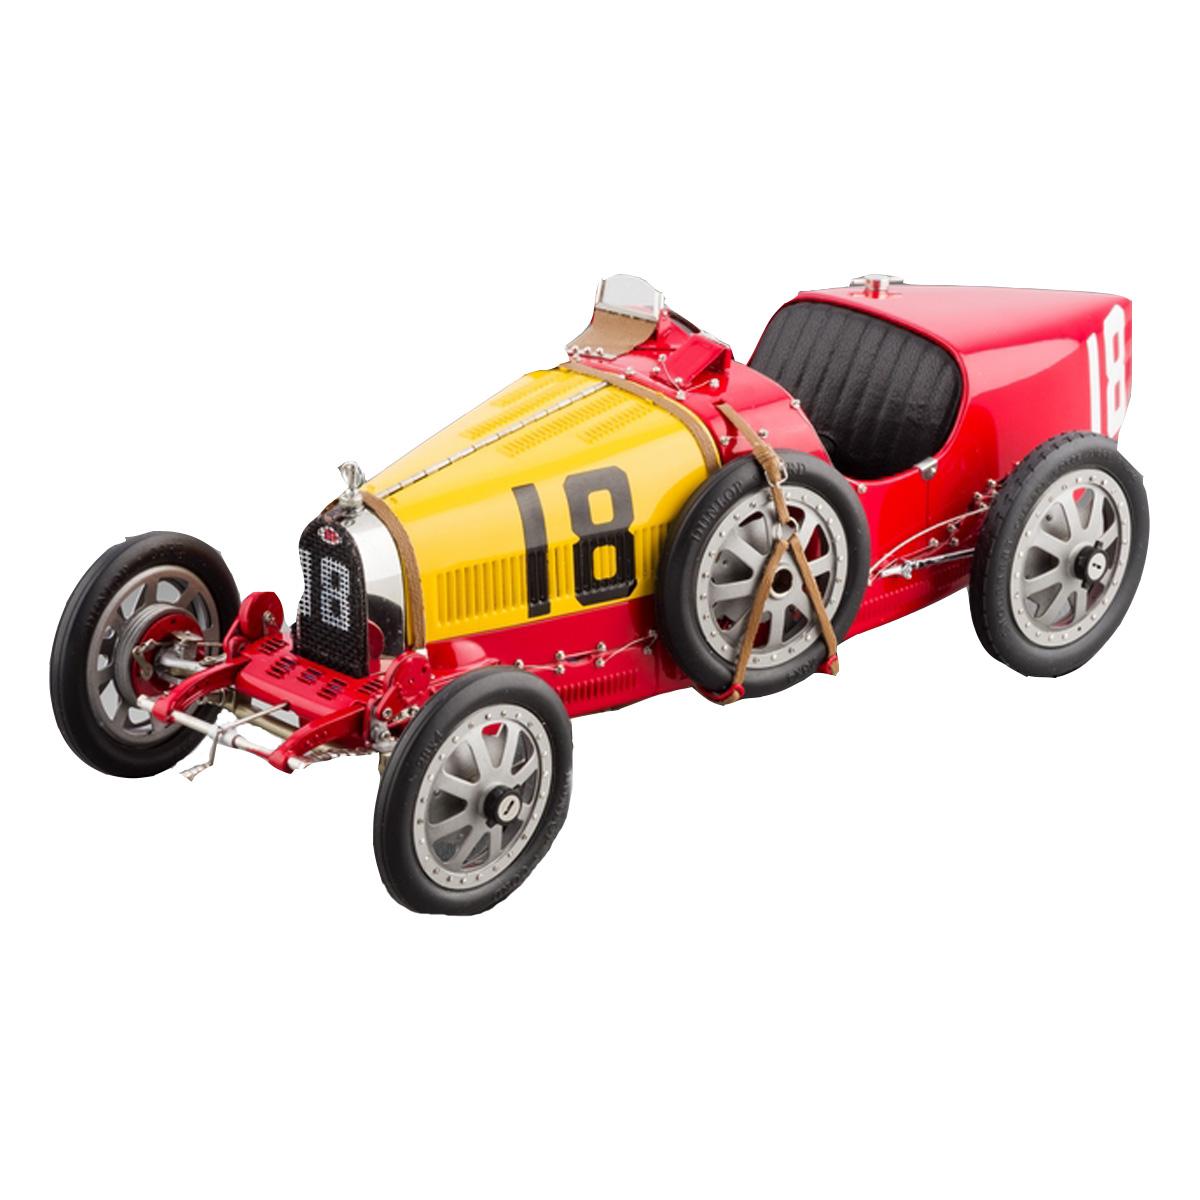 CMC Bugatti T35, Spain, Limited Edition 2,000 pcs